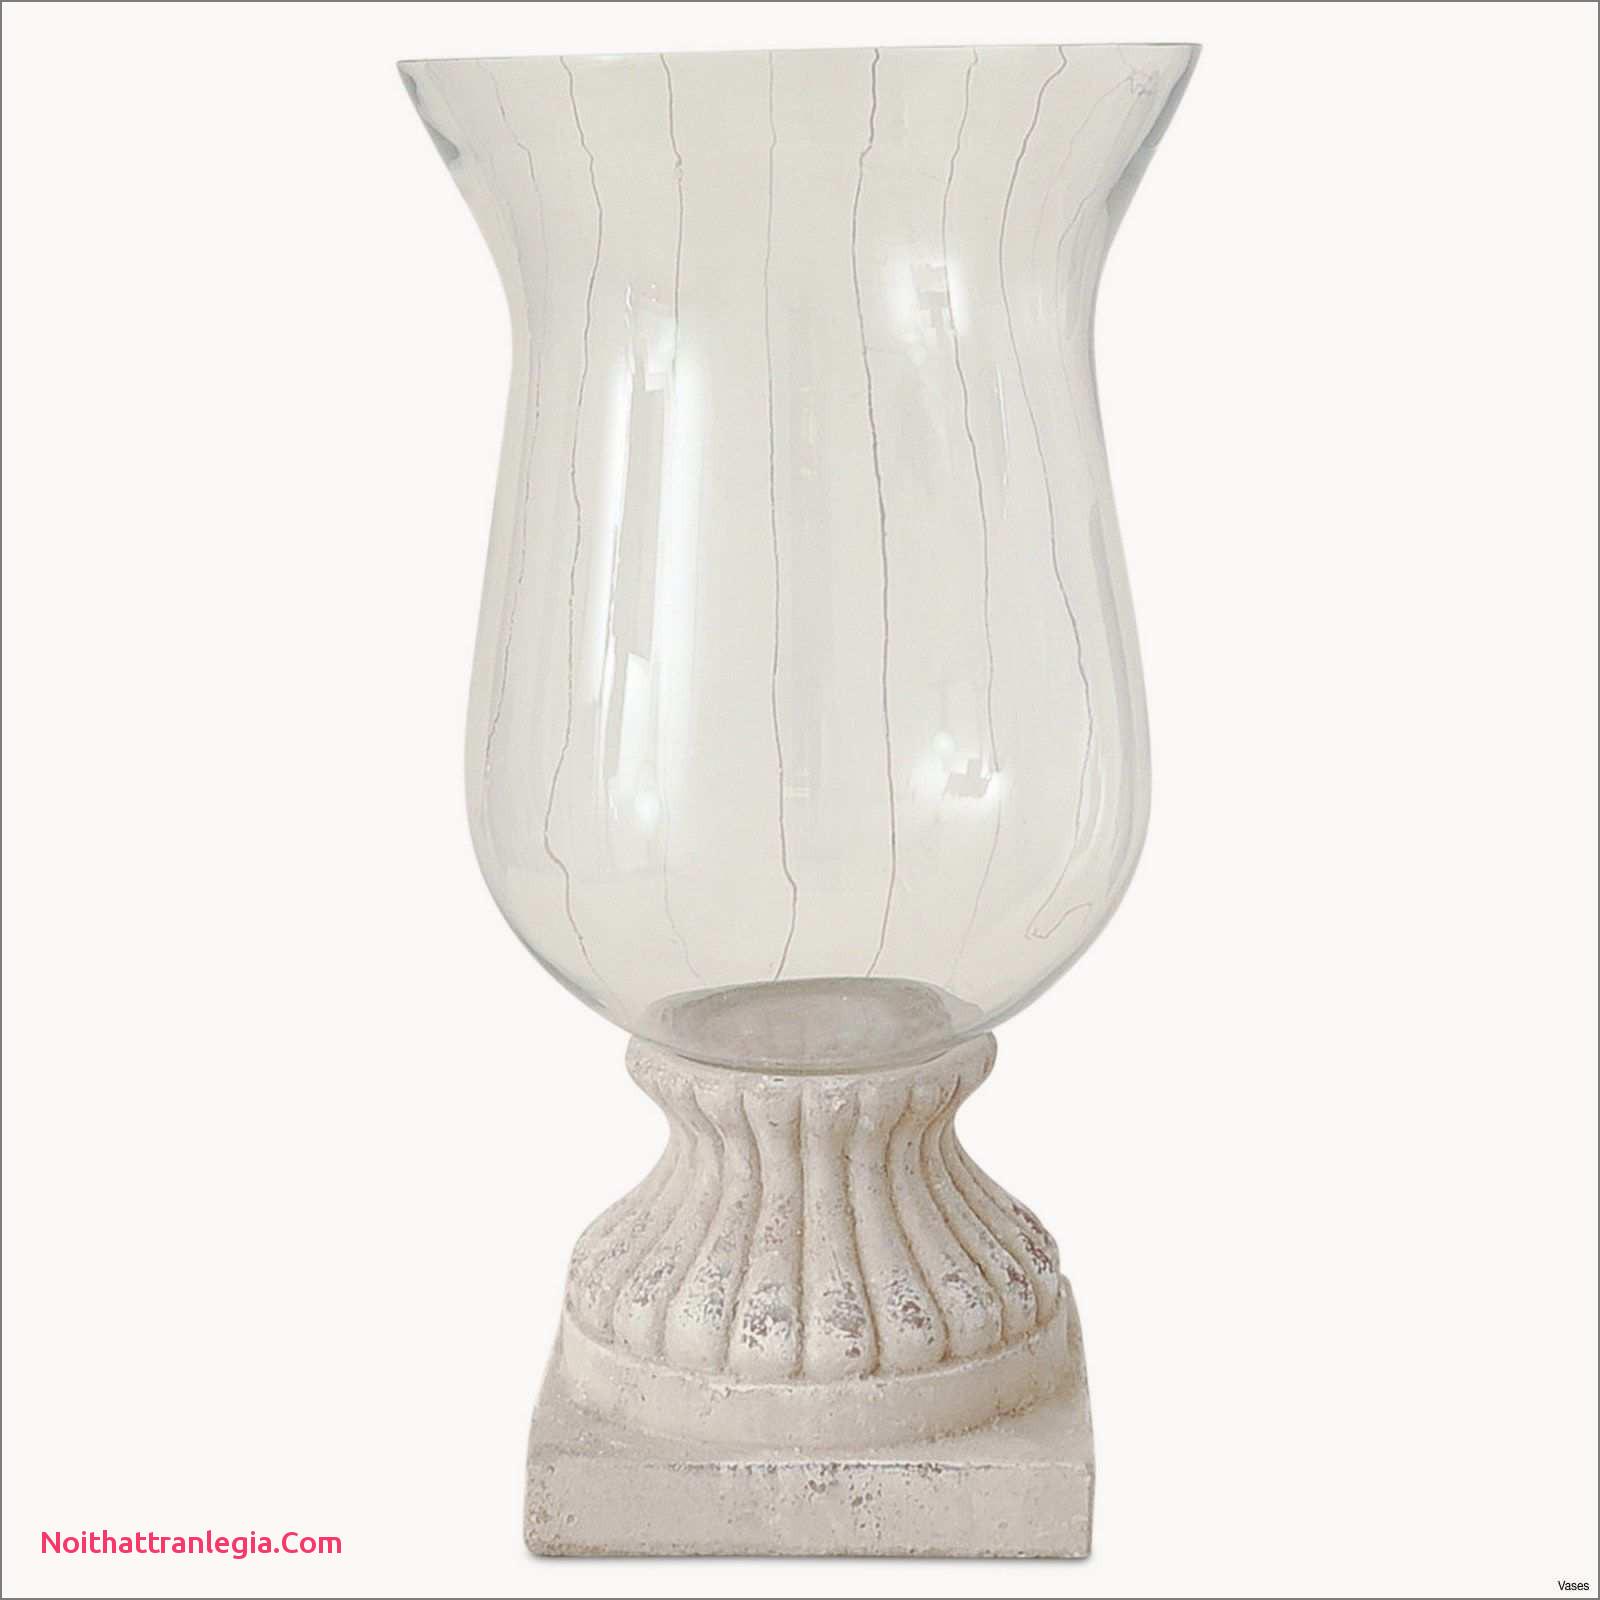 square metal vase of 20 how to make mercury glass vases noithattranlegia vases design pertaining to vase lighting base gallery gold table lamp base fresh how to make a table lamp 10h